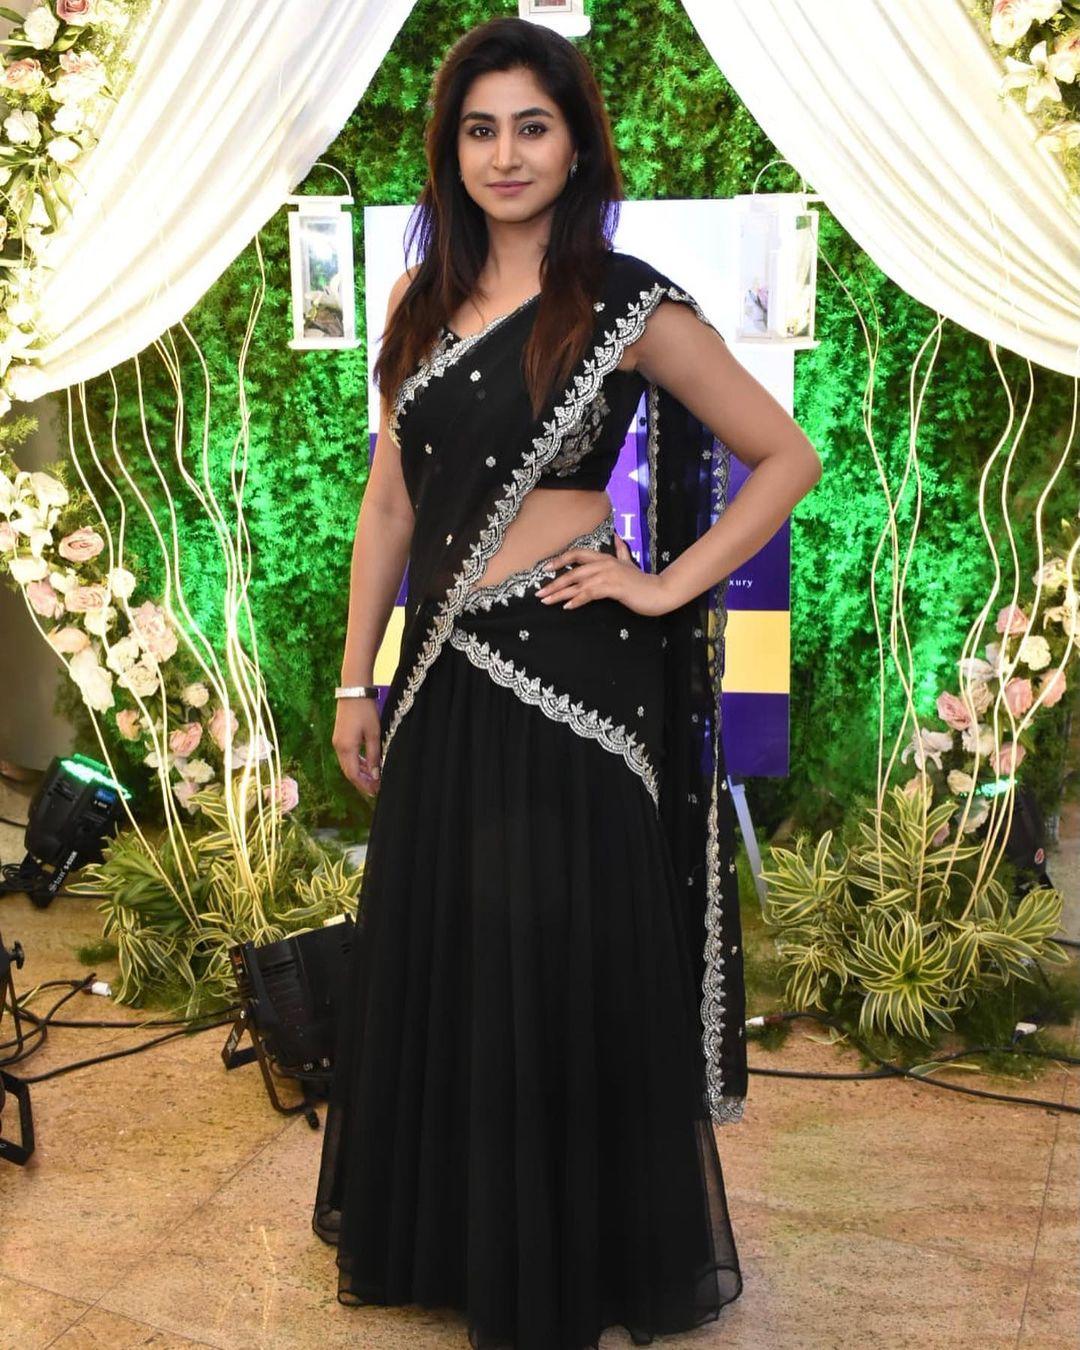 Gorgeous actress Varshini Soude Rajan in black half saree  for Hi life exhibition. 2021-08-04